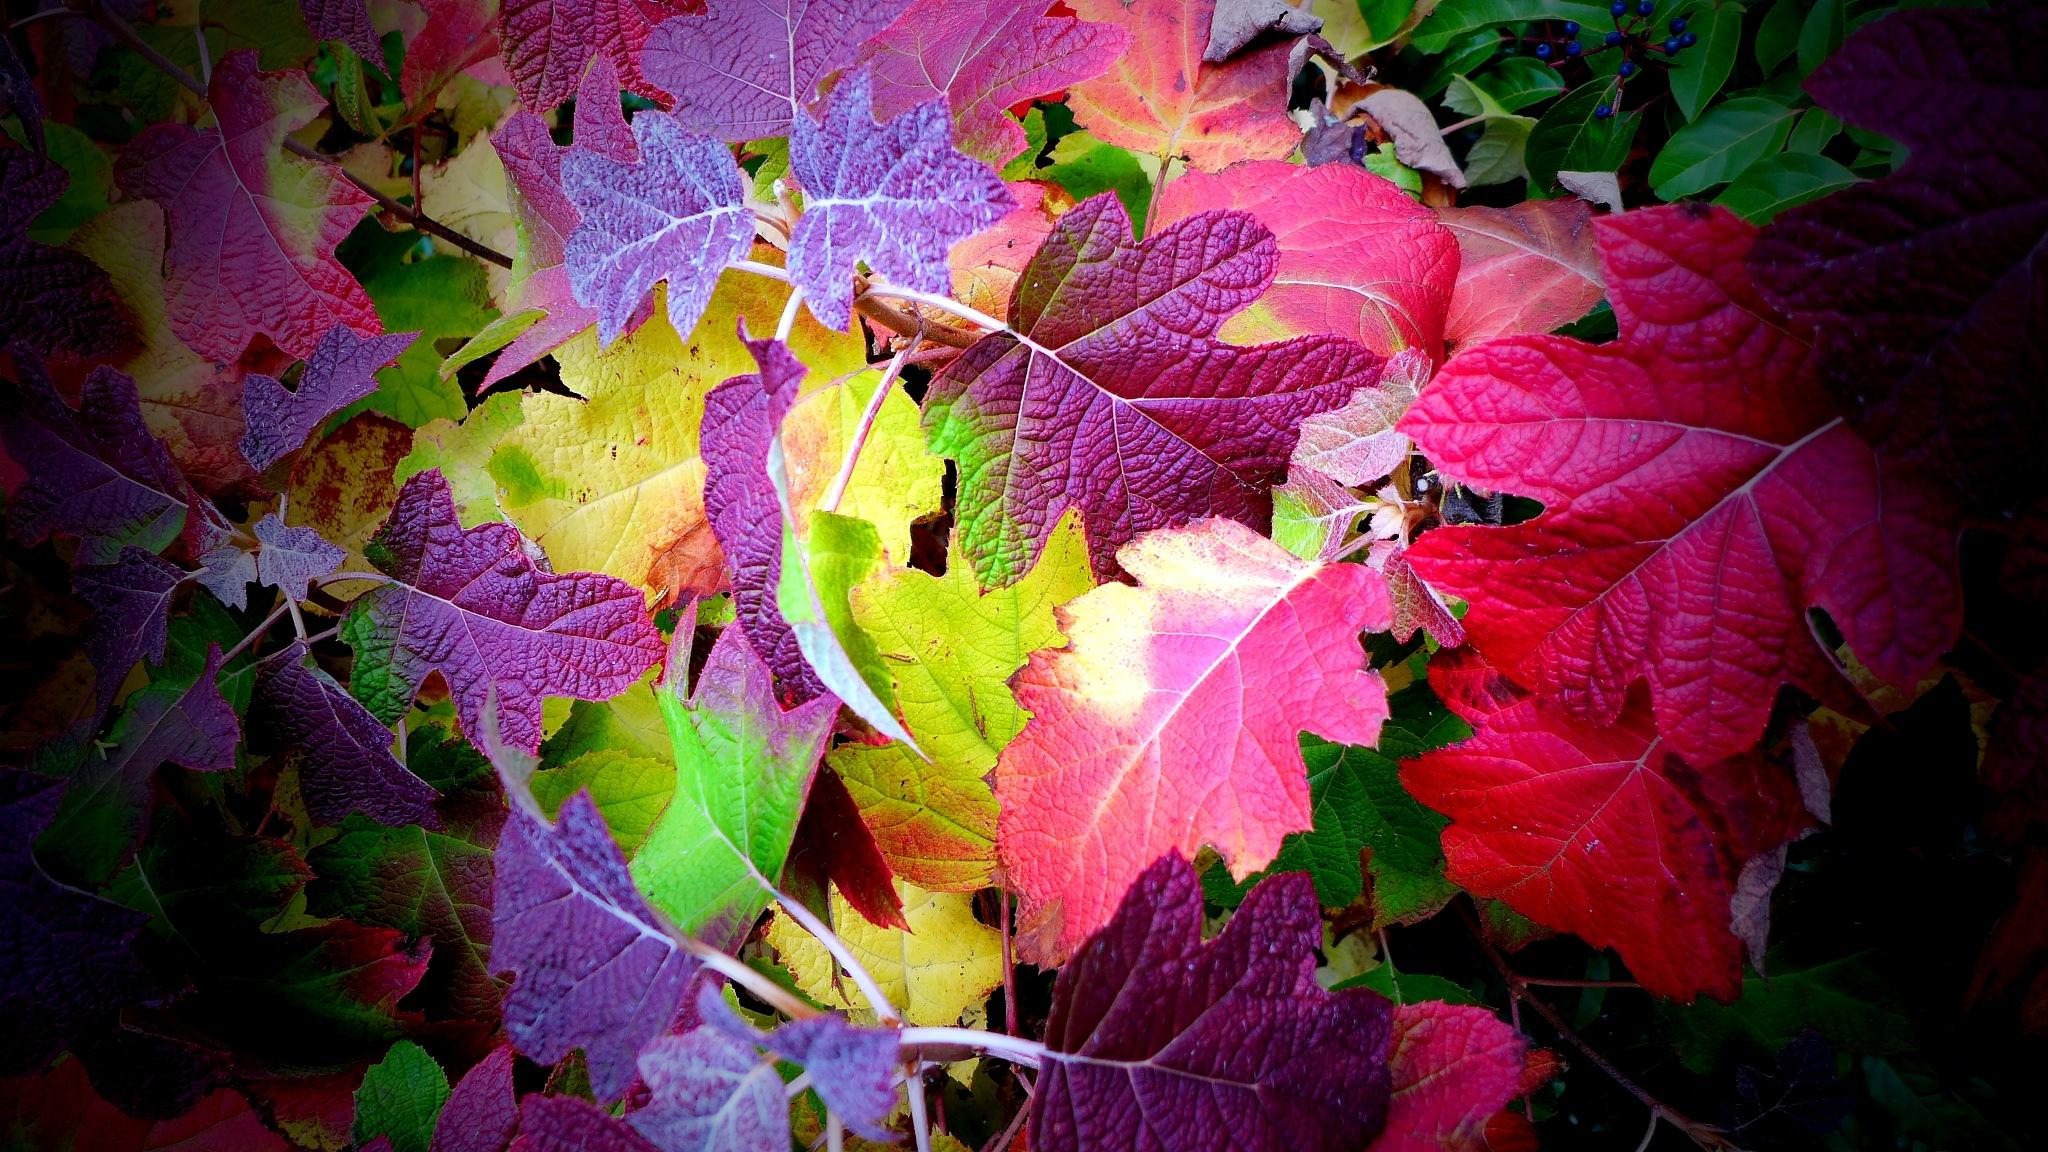 Roadside, Maple Leaves British Columbia by Miloliidrifter